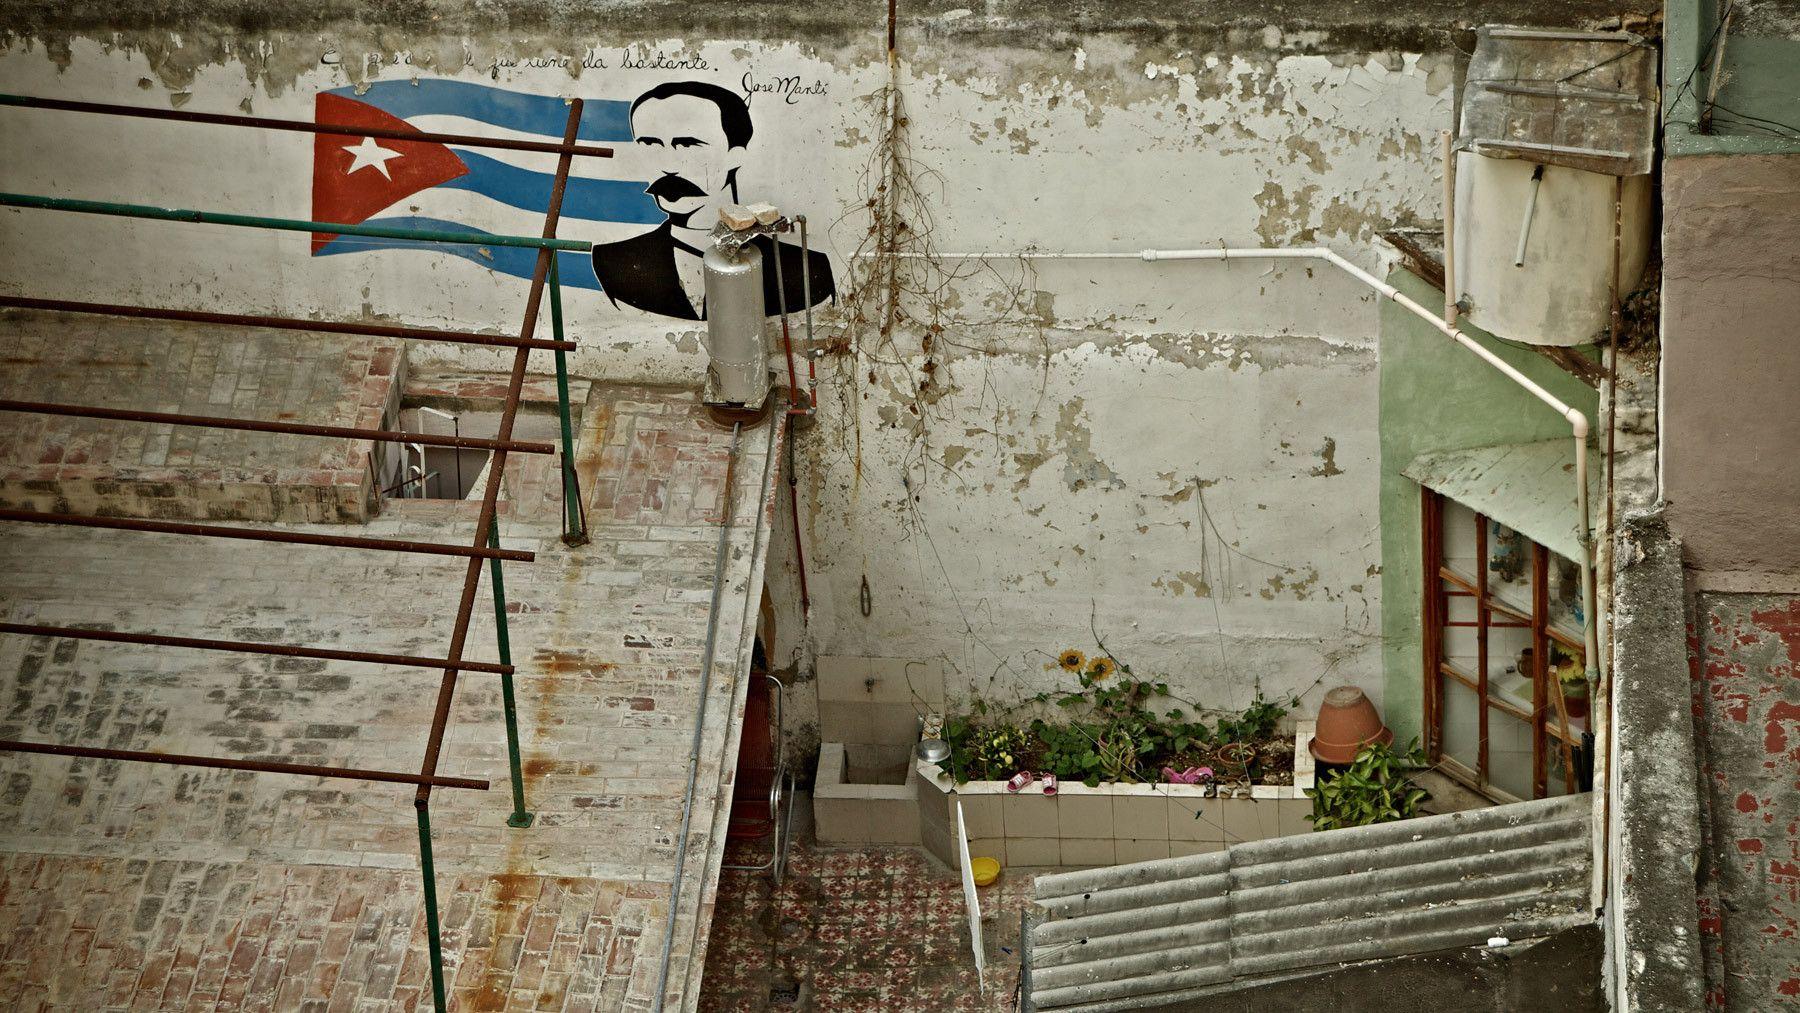 1jose_marti_mural_street_art_la_habana_vieja_old_havana_cuba.jpg